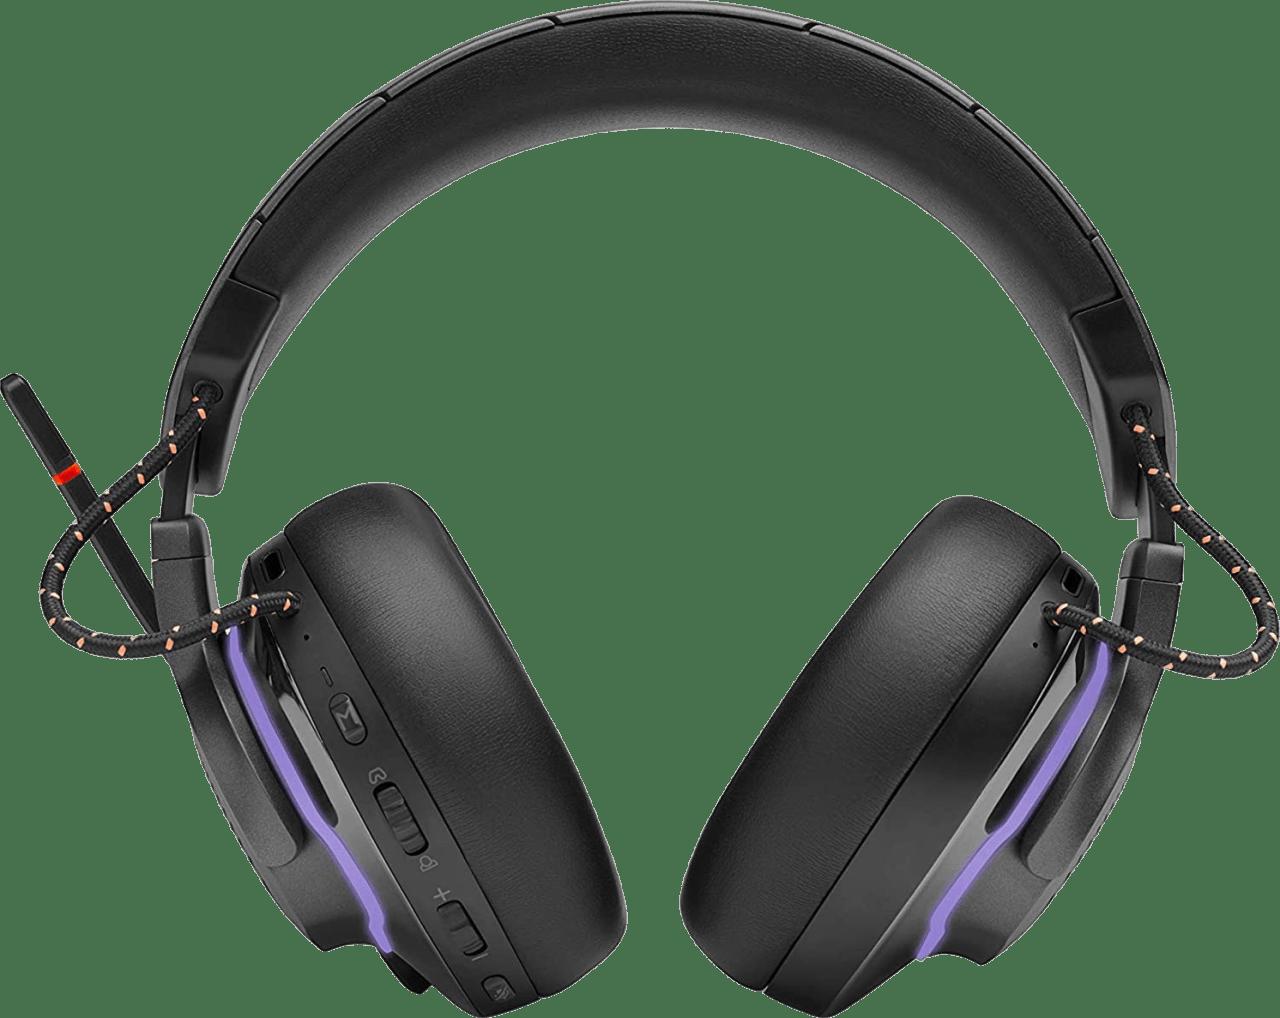 Schwarz JBL Quantum 800 Over-Ear-Gaming-Kopfhörer.3